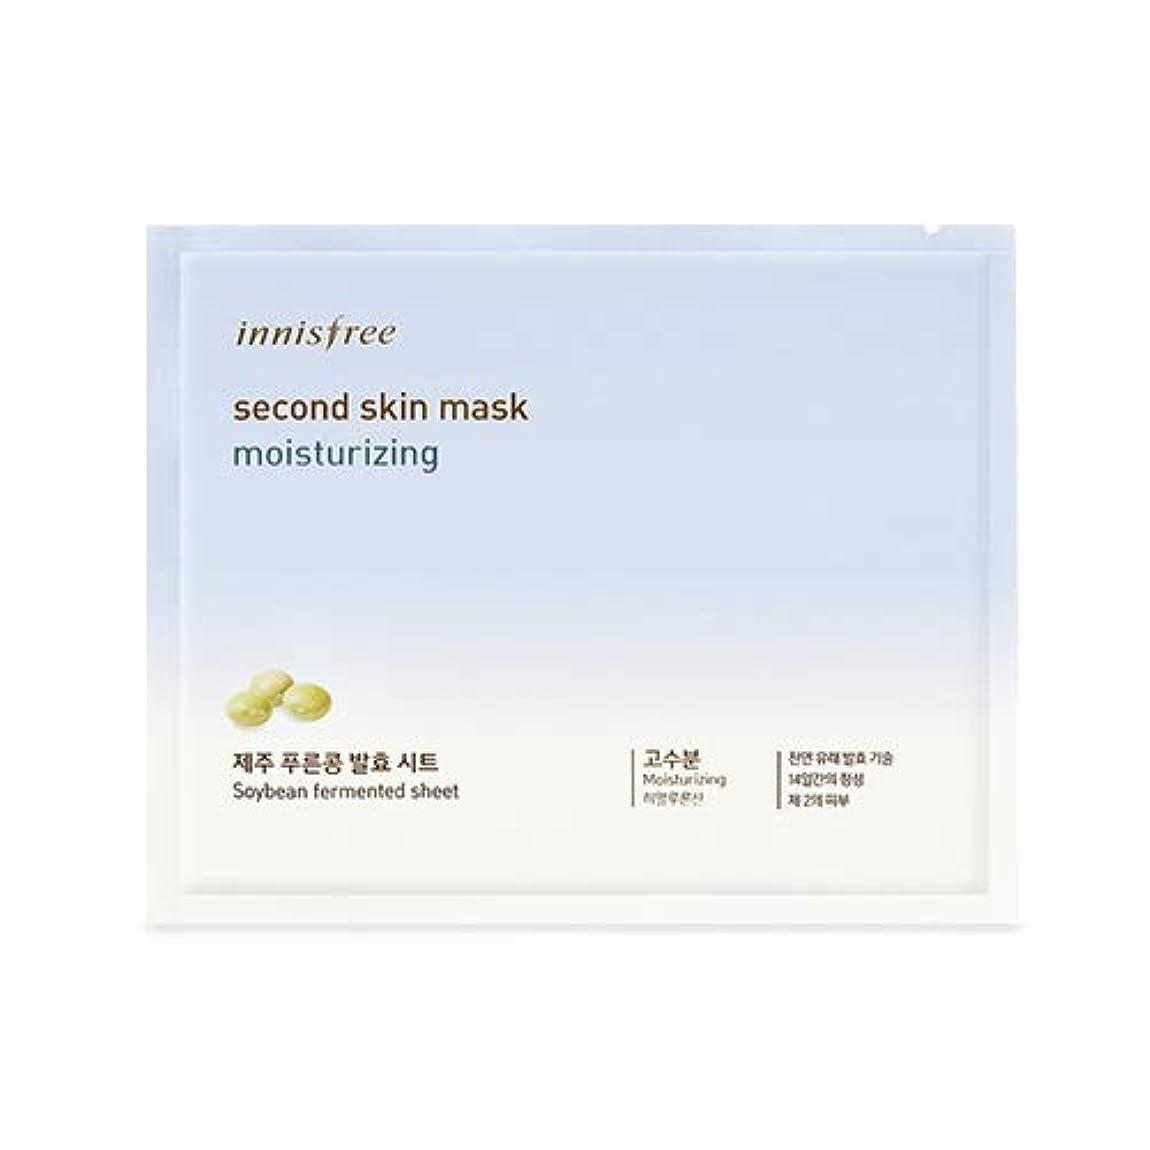 [Original] イニスフリーセカンドスキンマスクシート20g x 3個 - モイスチャライジング/Innisfree Second Skin Mask Sheet 20g x 3pcs - Moisturizing...